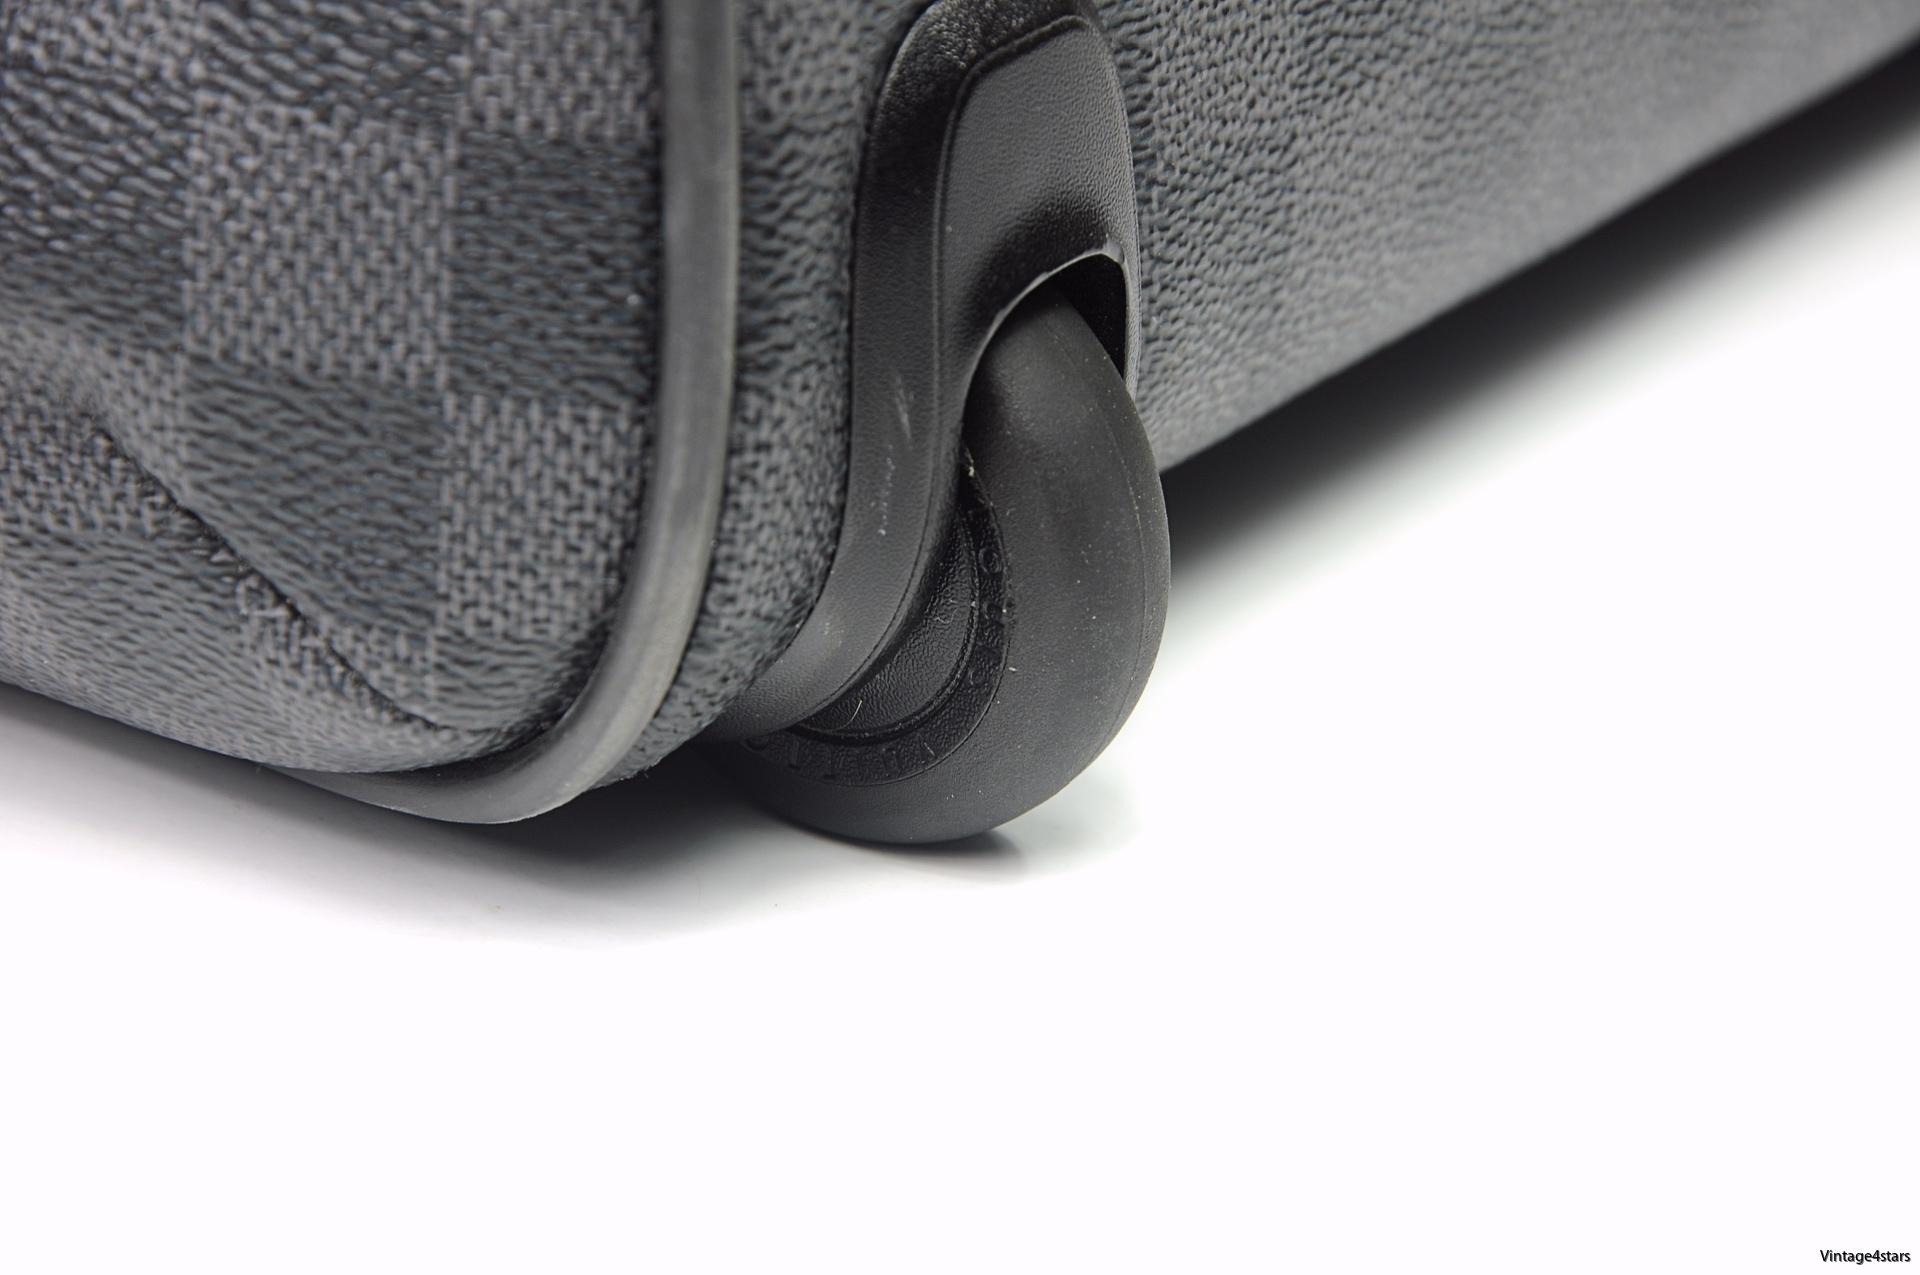 Louis Vuitton Eole 55 NEO Graphite 6a